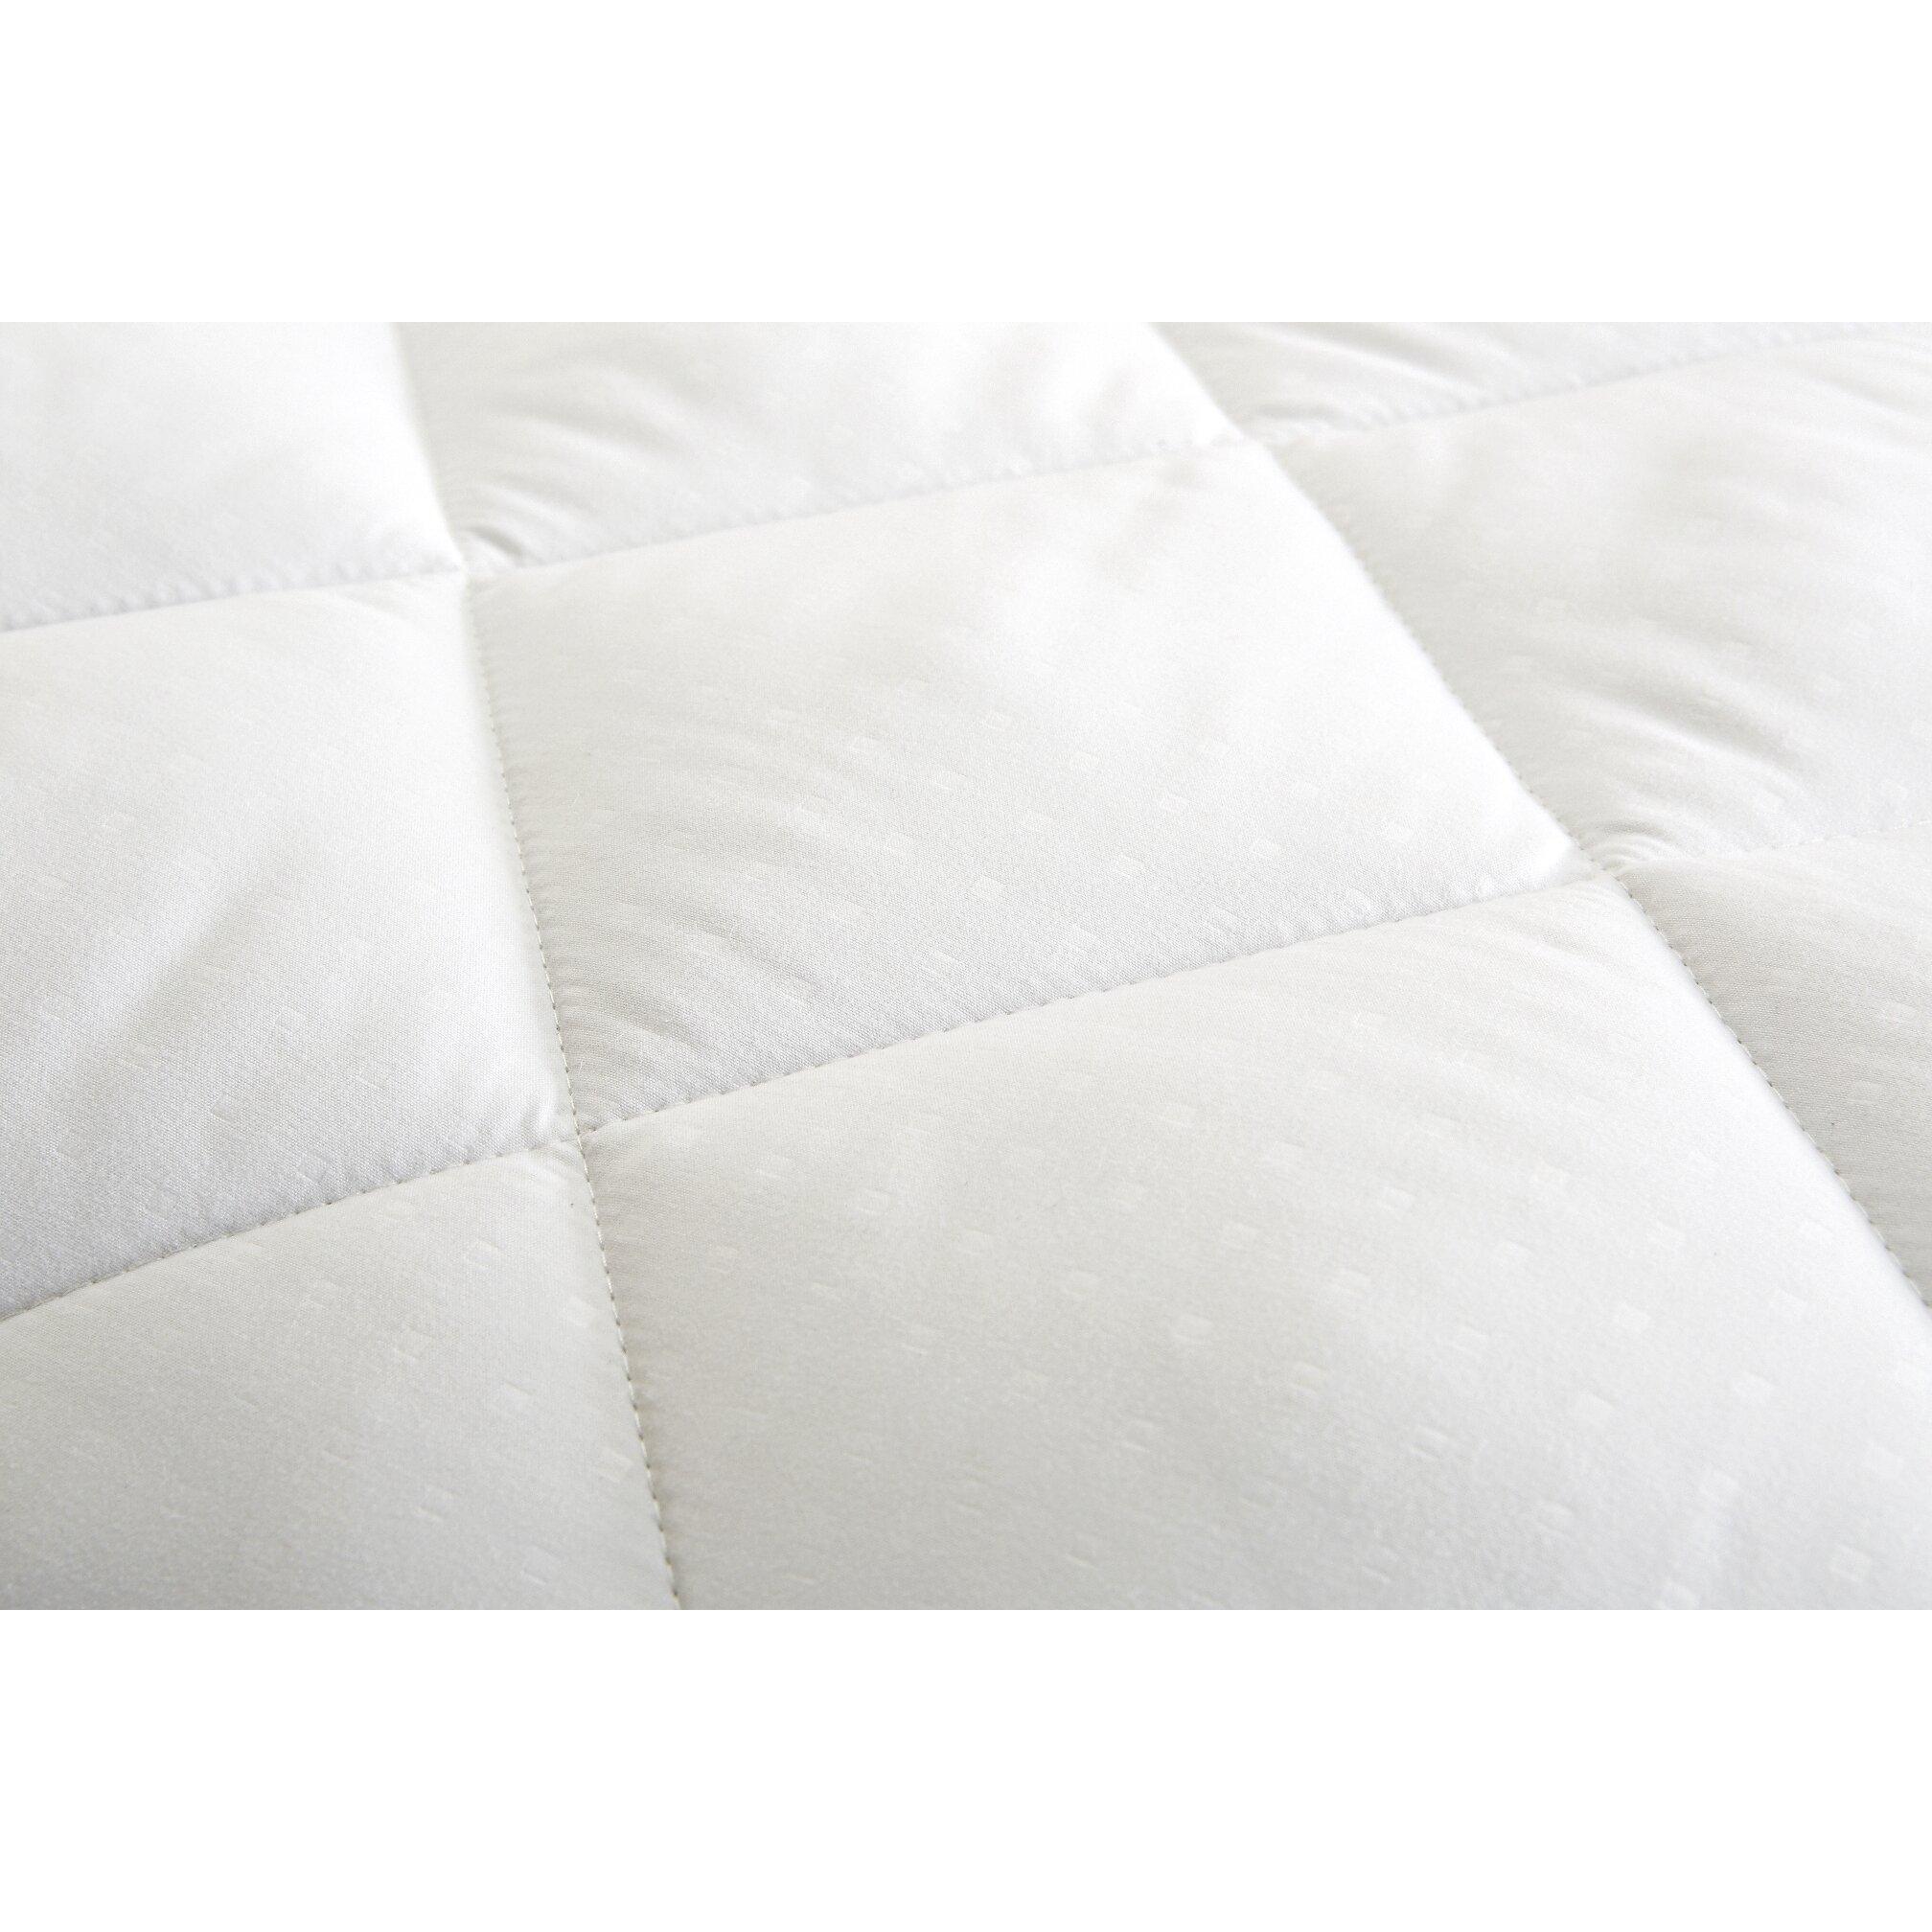 House floor plan ranch style bedroom michael douglas mallorca house home design - Home design mattress pads ...